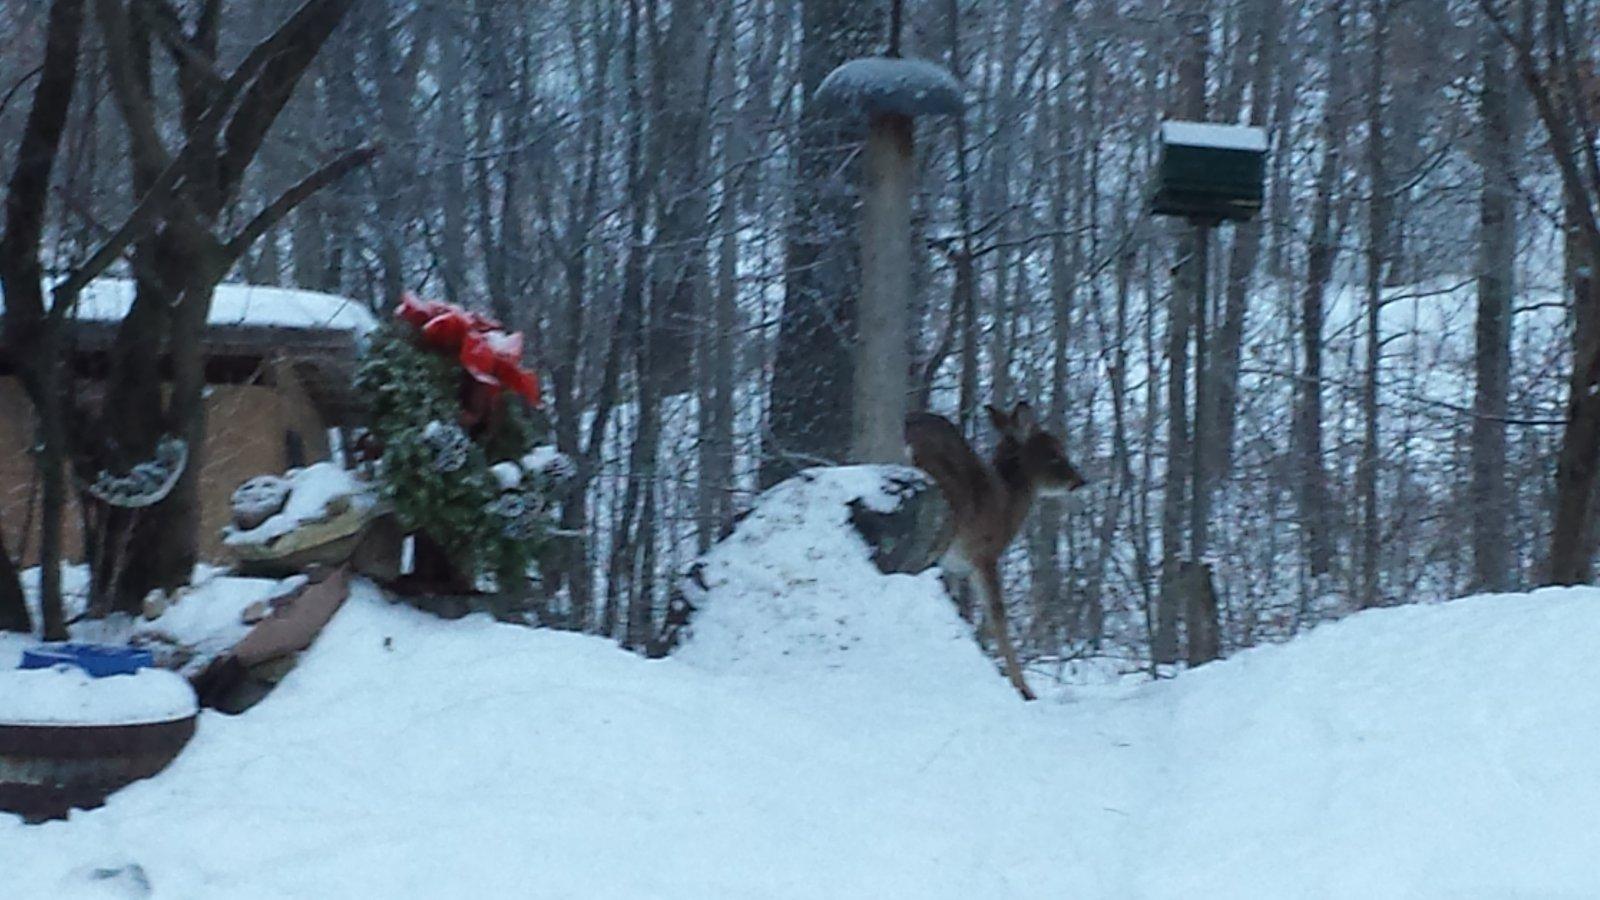 Click image for larger version  Name:Deer at feeder.jpg Views:63 Size:209.9 KB ID:55738